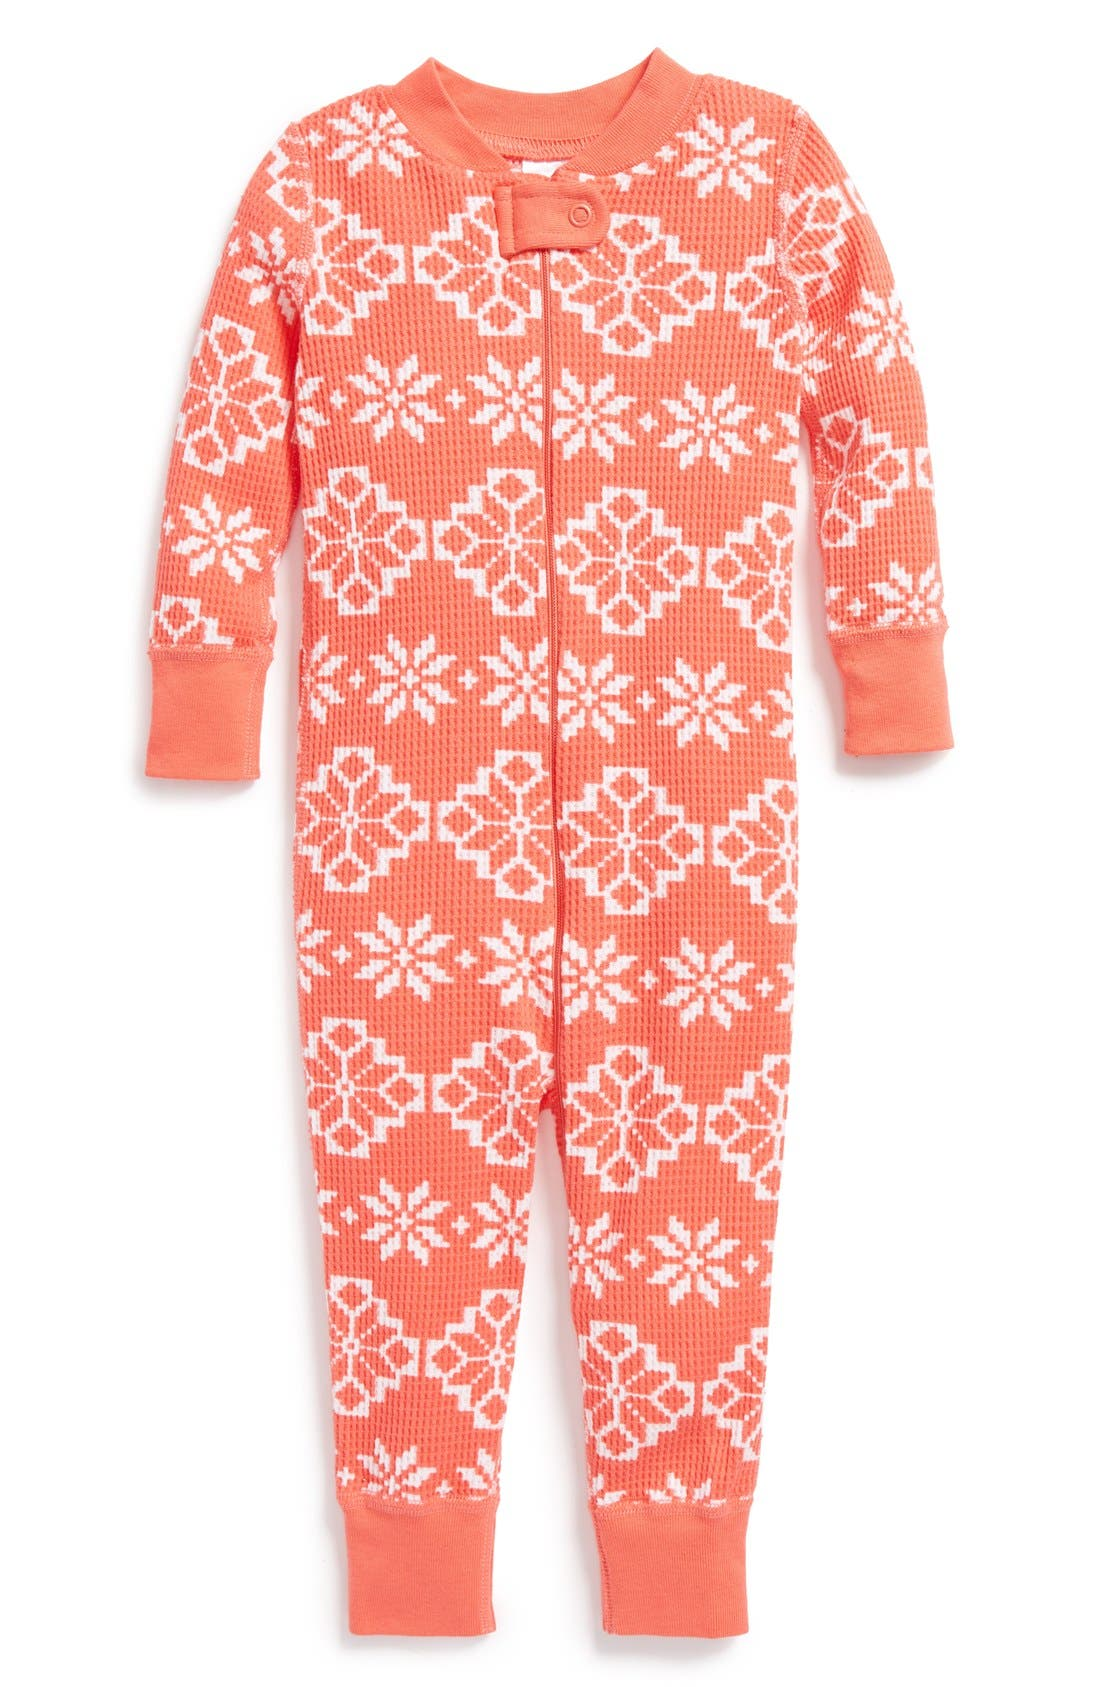 Main Image - Hanna Andersson Organic Cotton Romper Pajamas (Baby Girls)